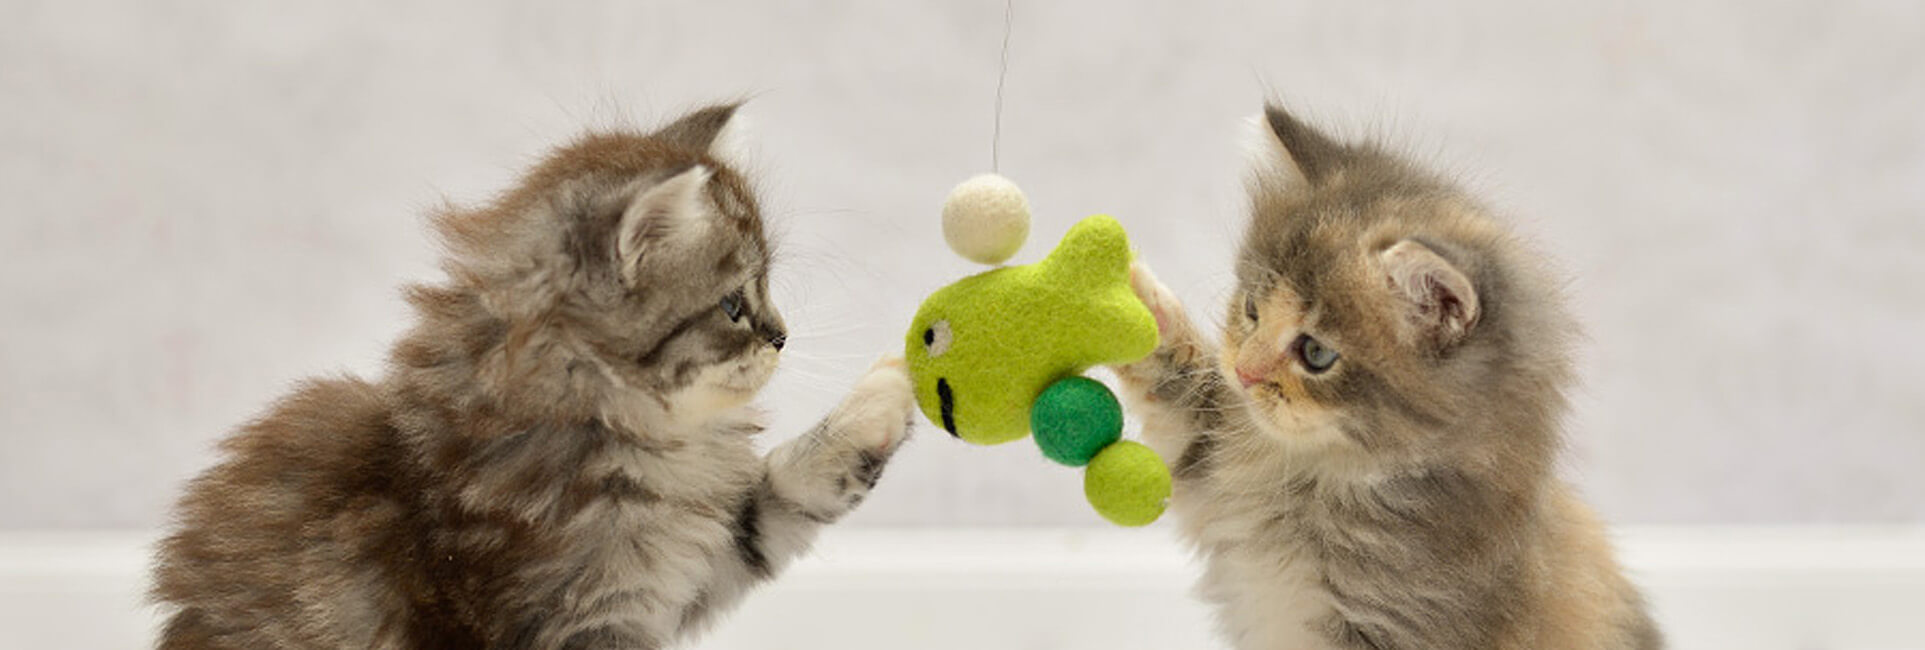 Spielende Kitten